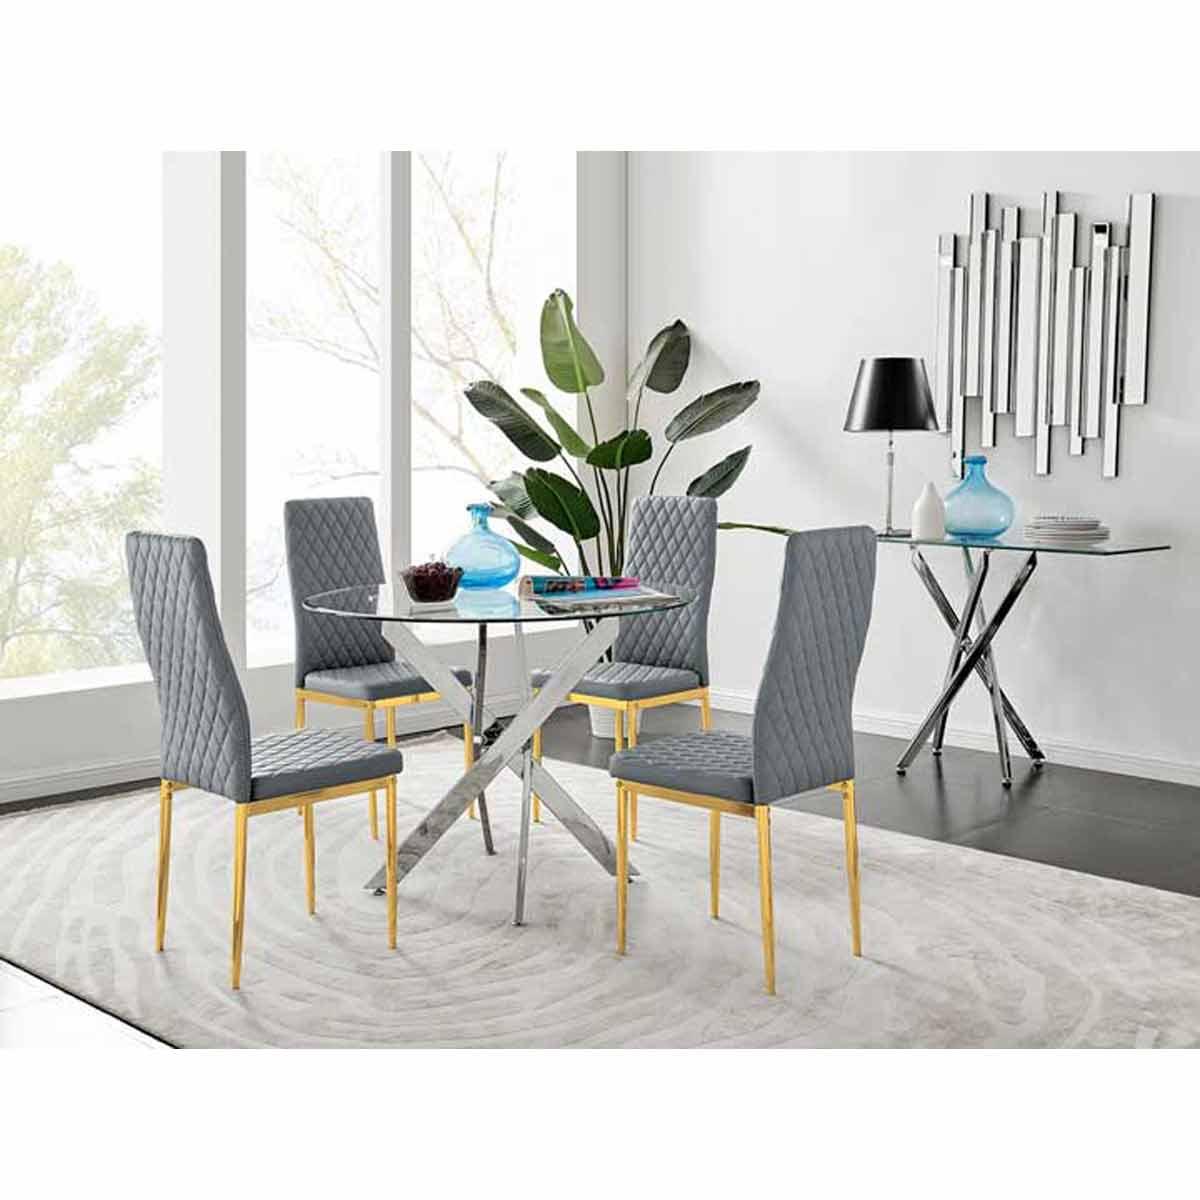 Furniture Box Novara 100cm Round Dining Table and 4 Grey Gold Leg Milan Chairs